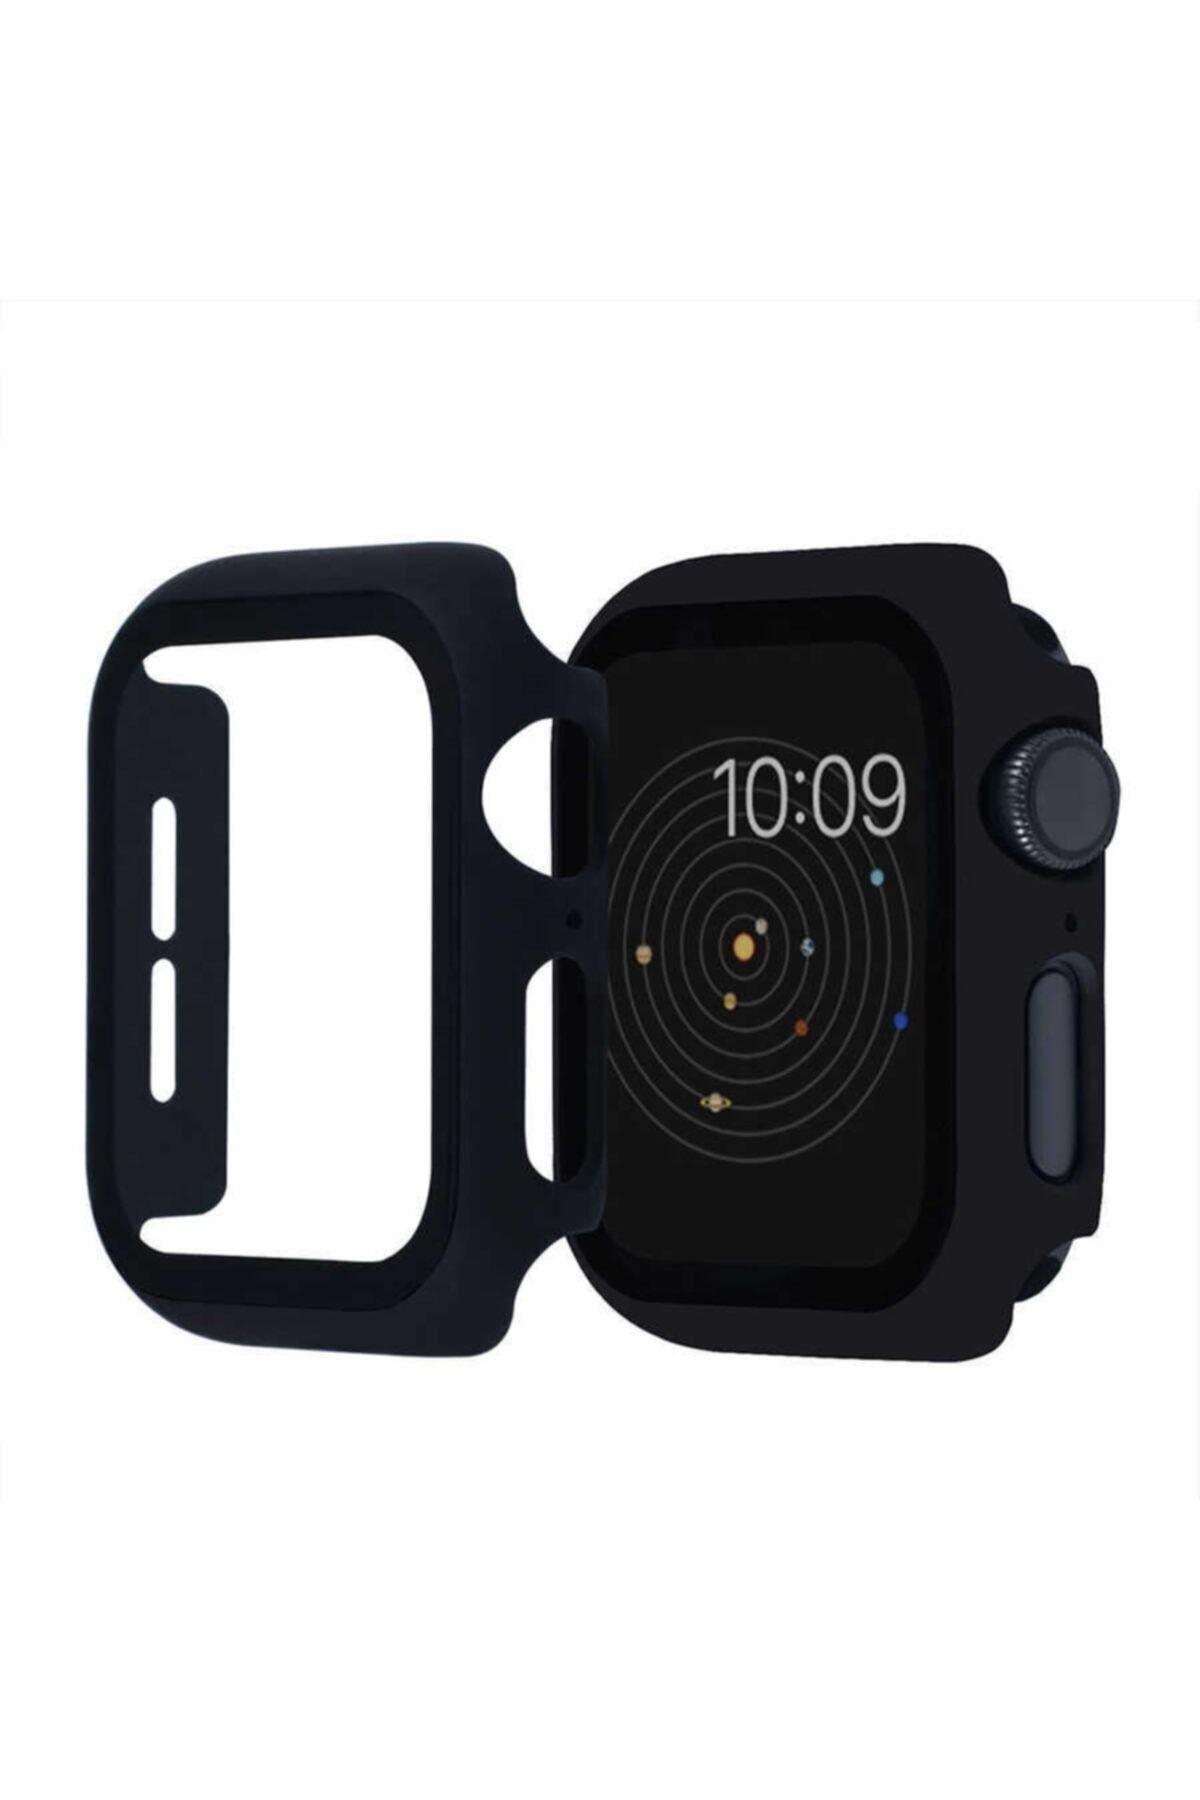 KVK PRİVACY Apple Watch Uyumlu Siyah Silikon Kılıf 42mm Tam Koruma  1 2 3 4 5 6 Se 1